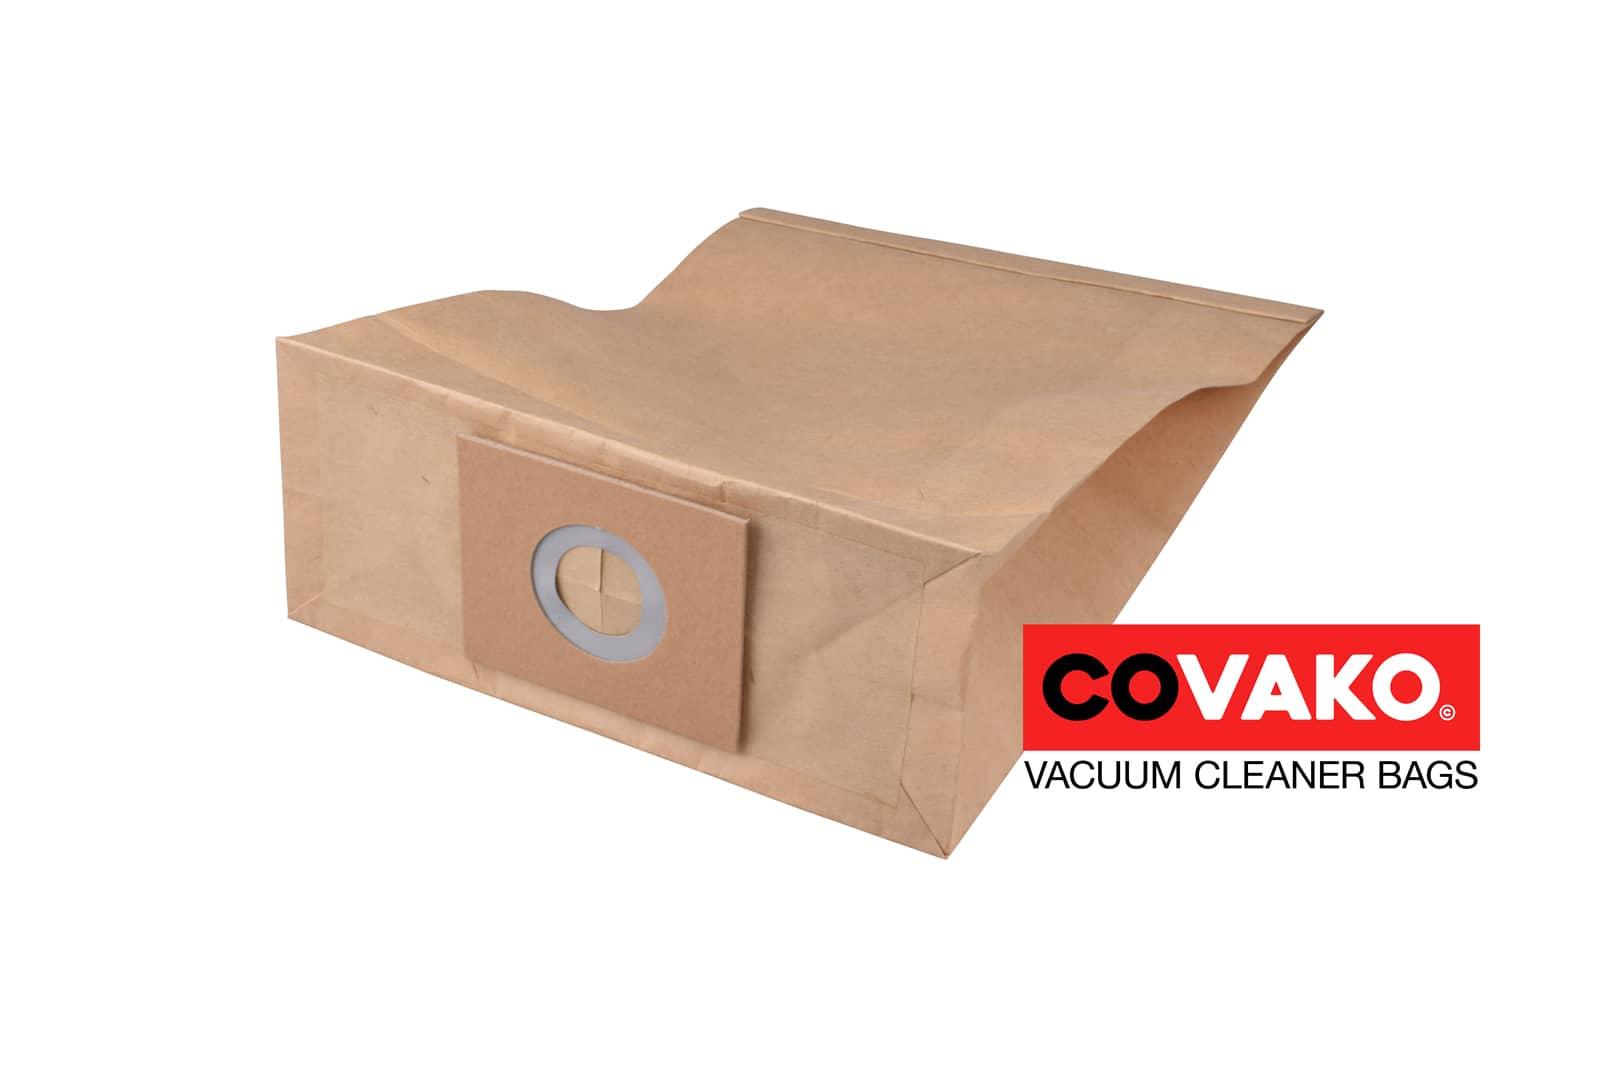 I-vac Dryver 10R / Papier - I-vac Staubsaugerbeutel